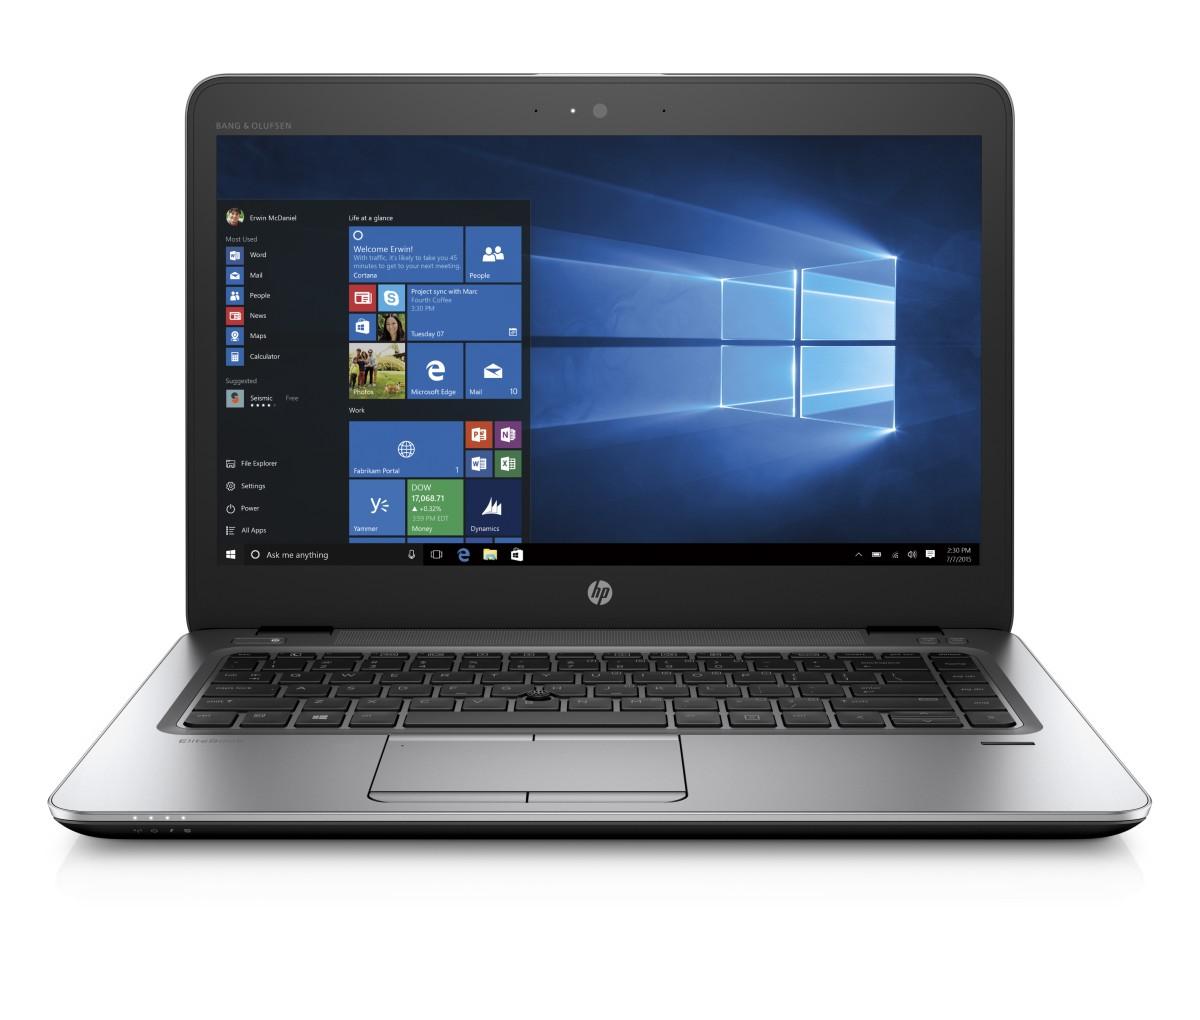 HP EliteBook 840 G4 i5-7200U 14 FHD CAM, 4GB, 256GB TurboG2+volny slot 2,5, ac, BT, FpR, backlit kbd, Win10Pro